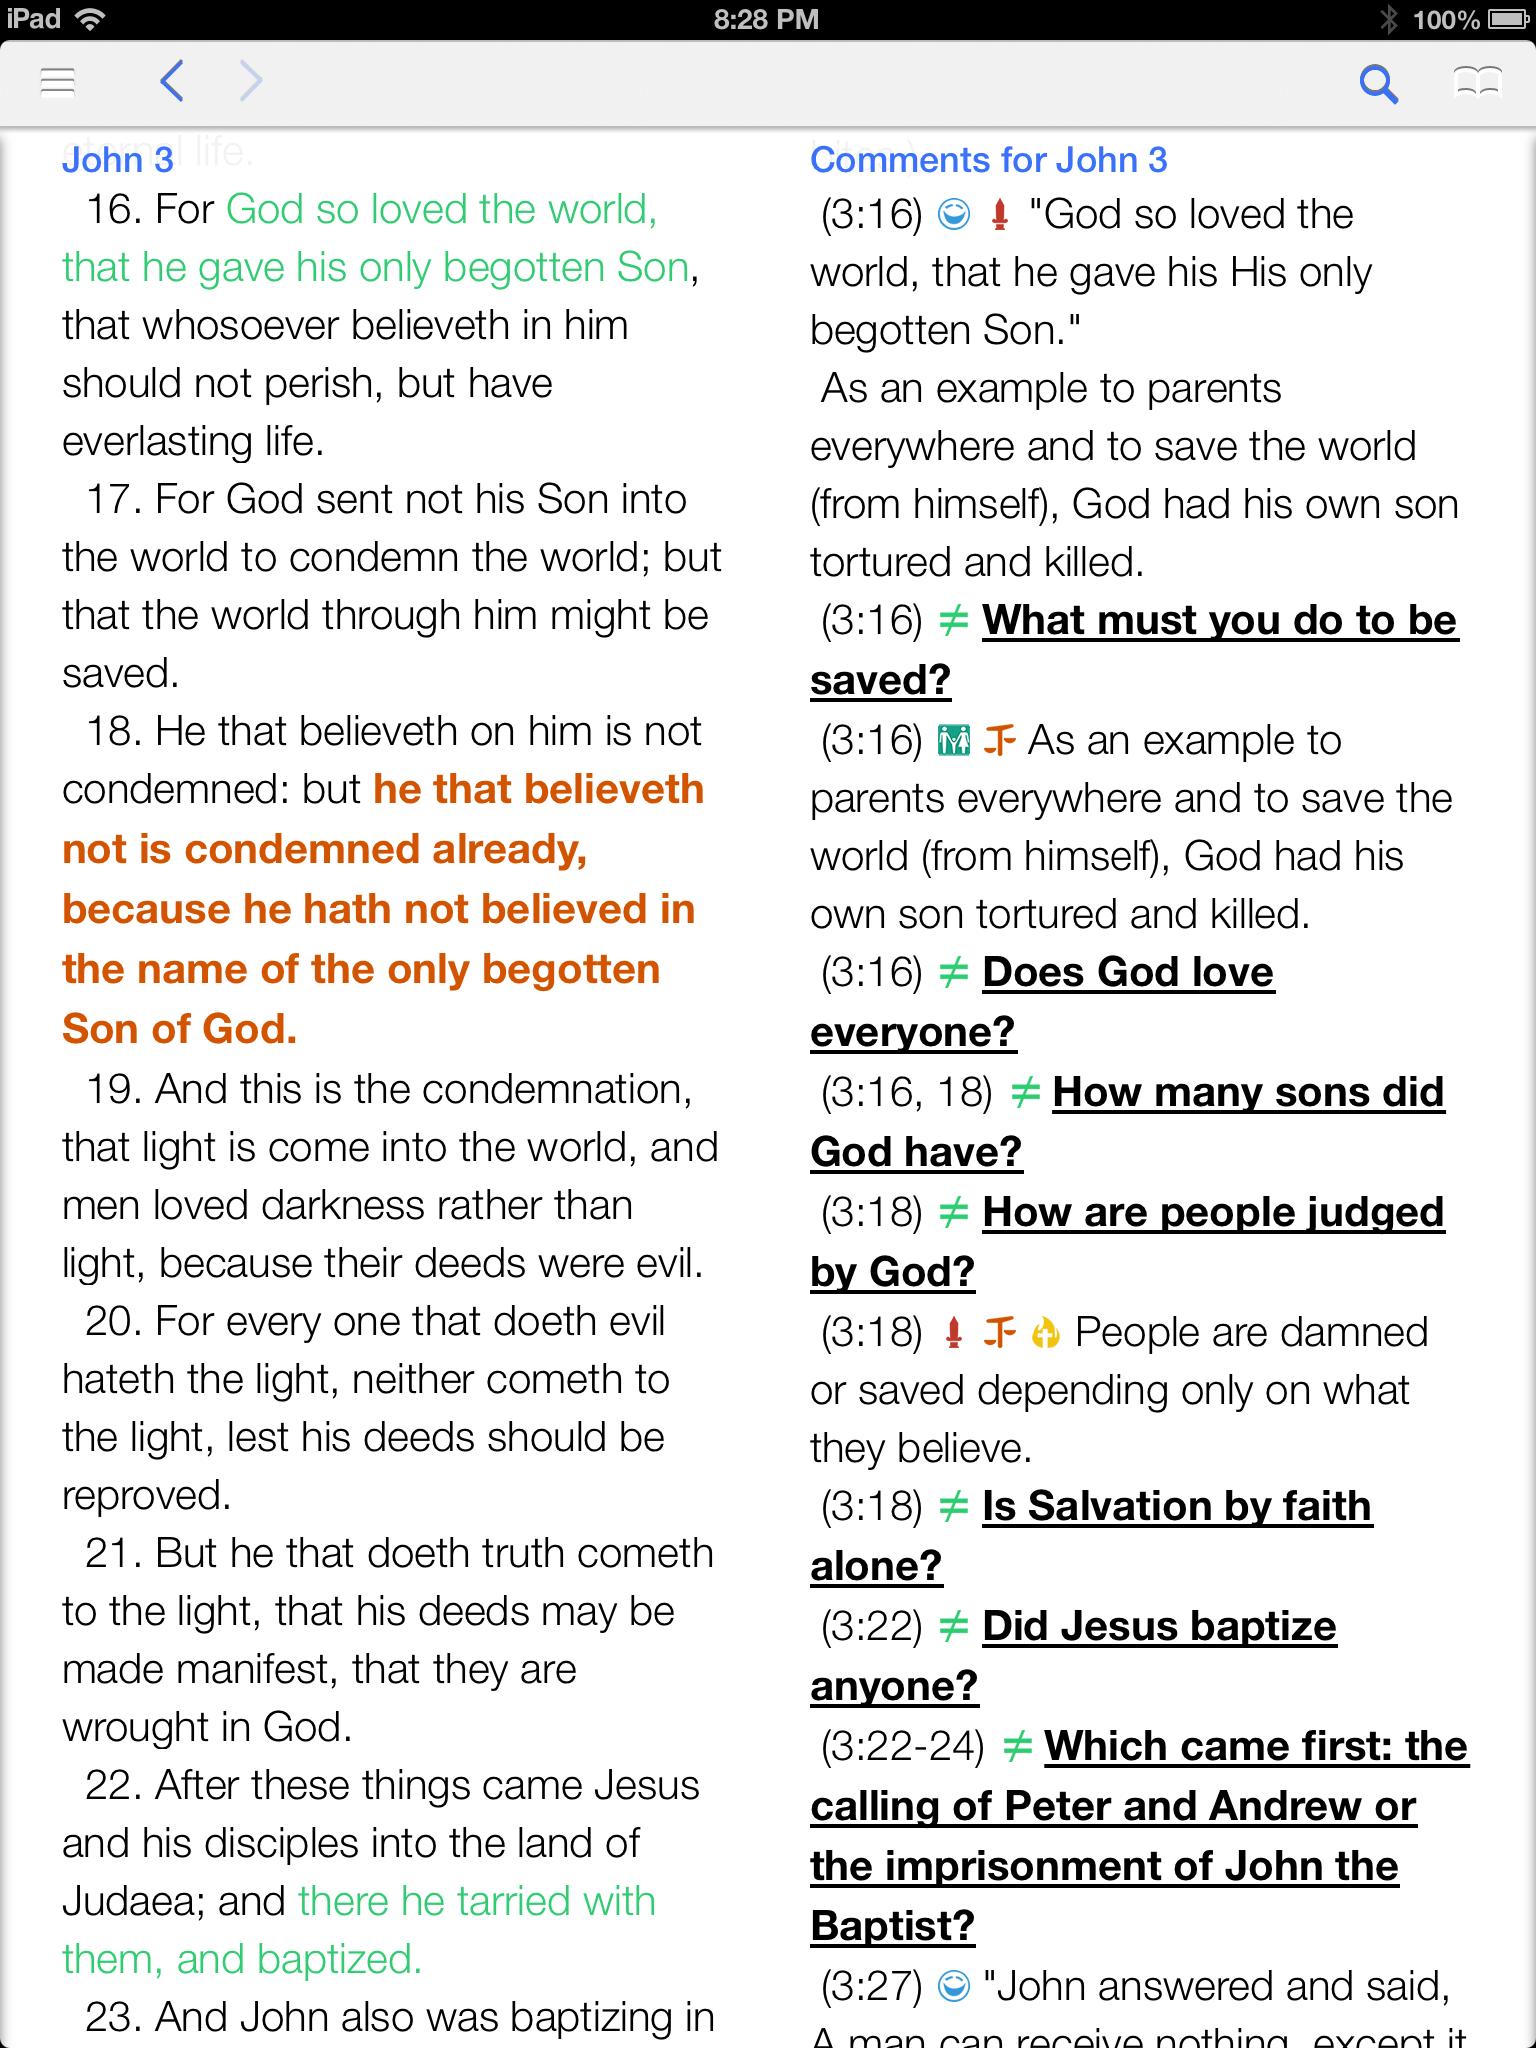 Annotated bibl